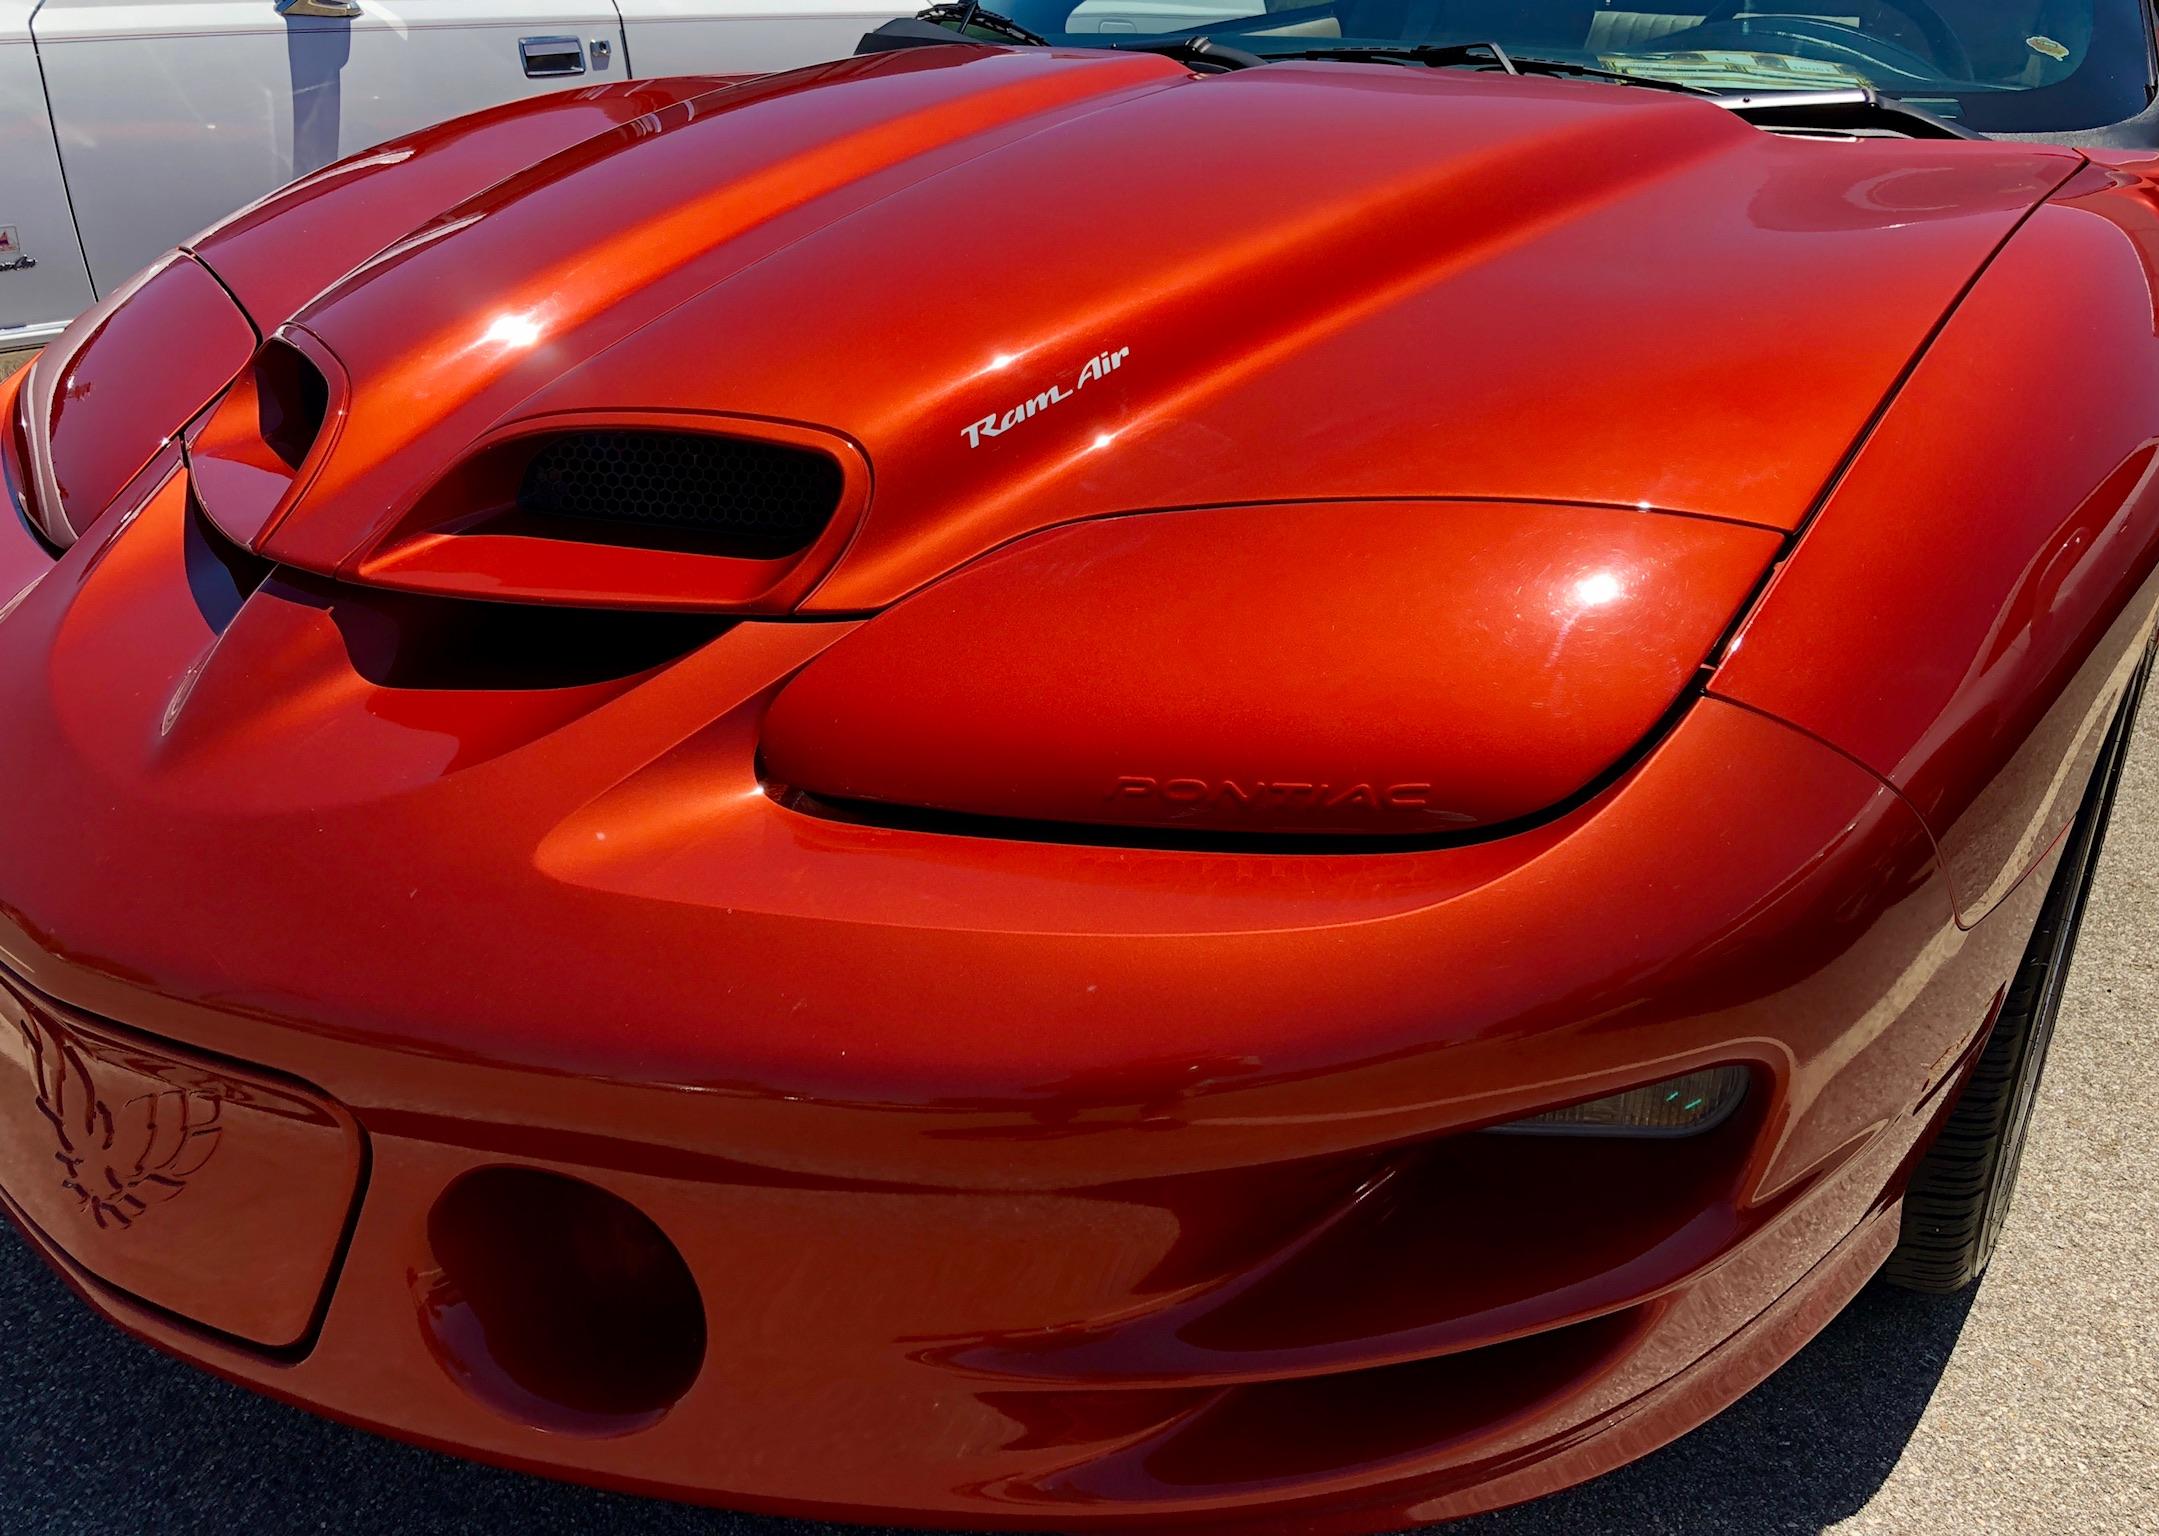 Pontiac - IMG_0654